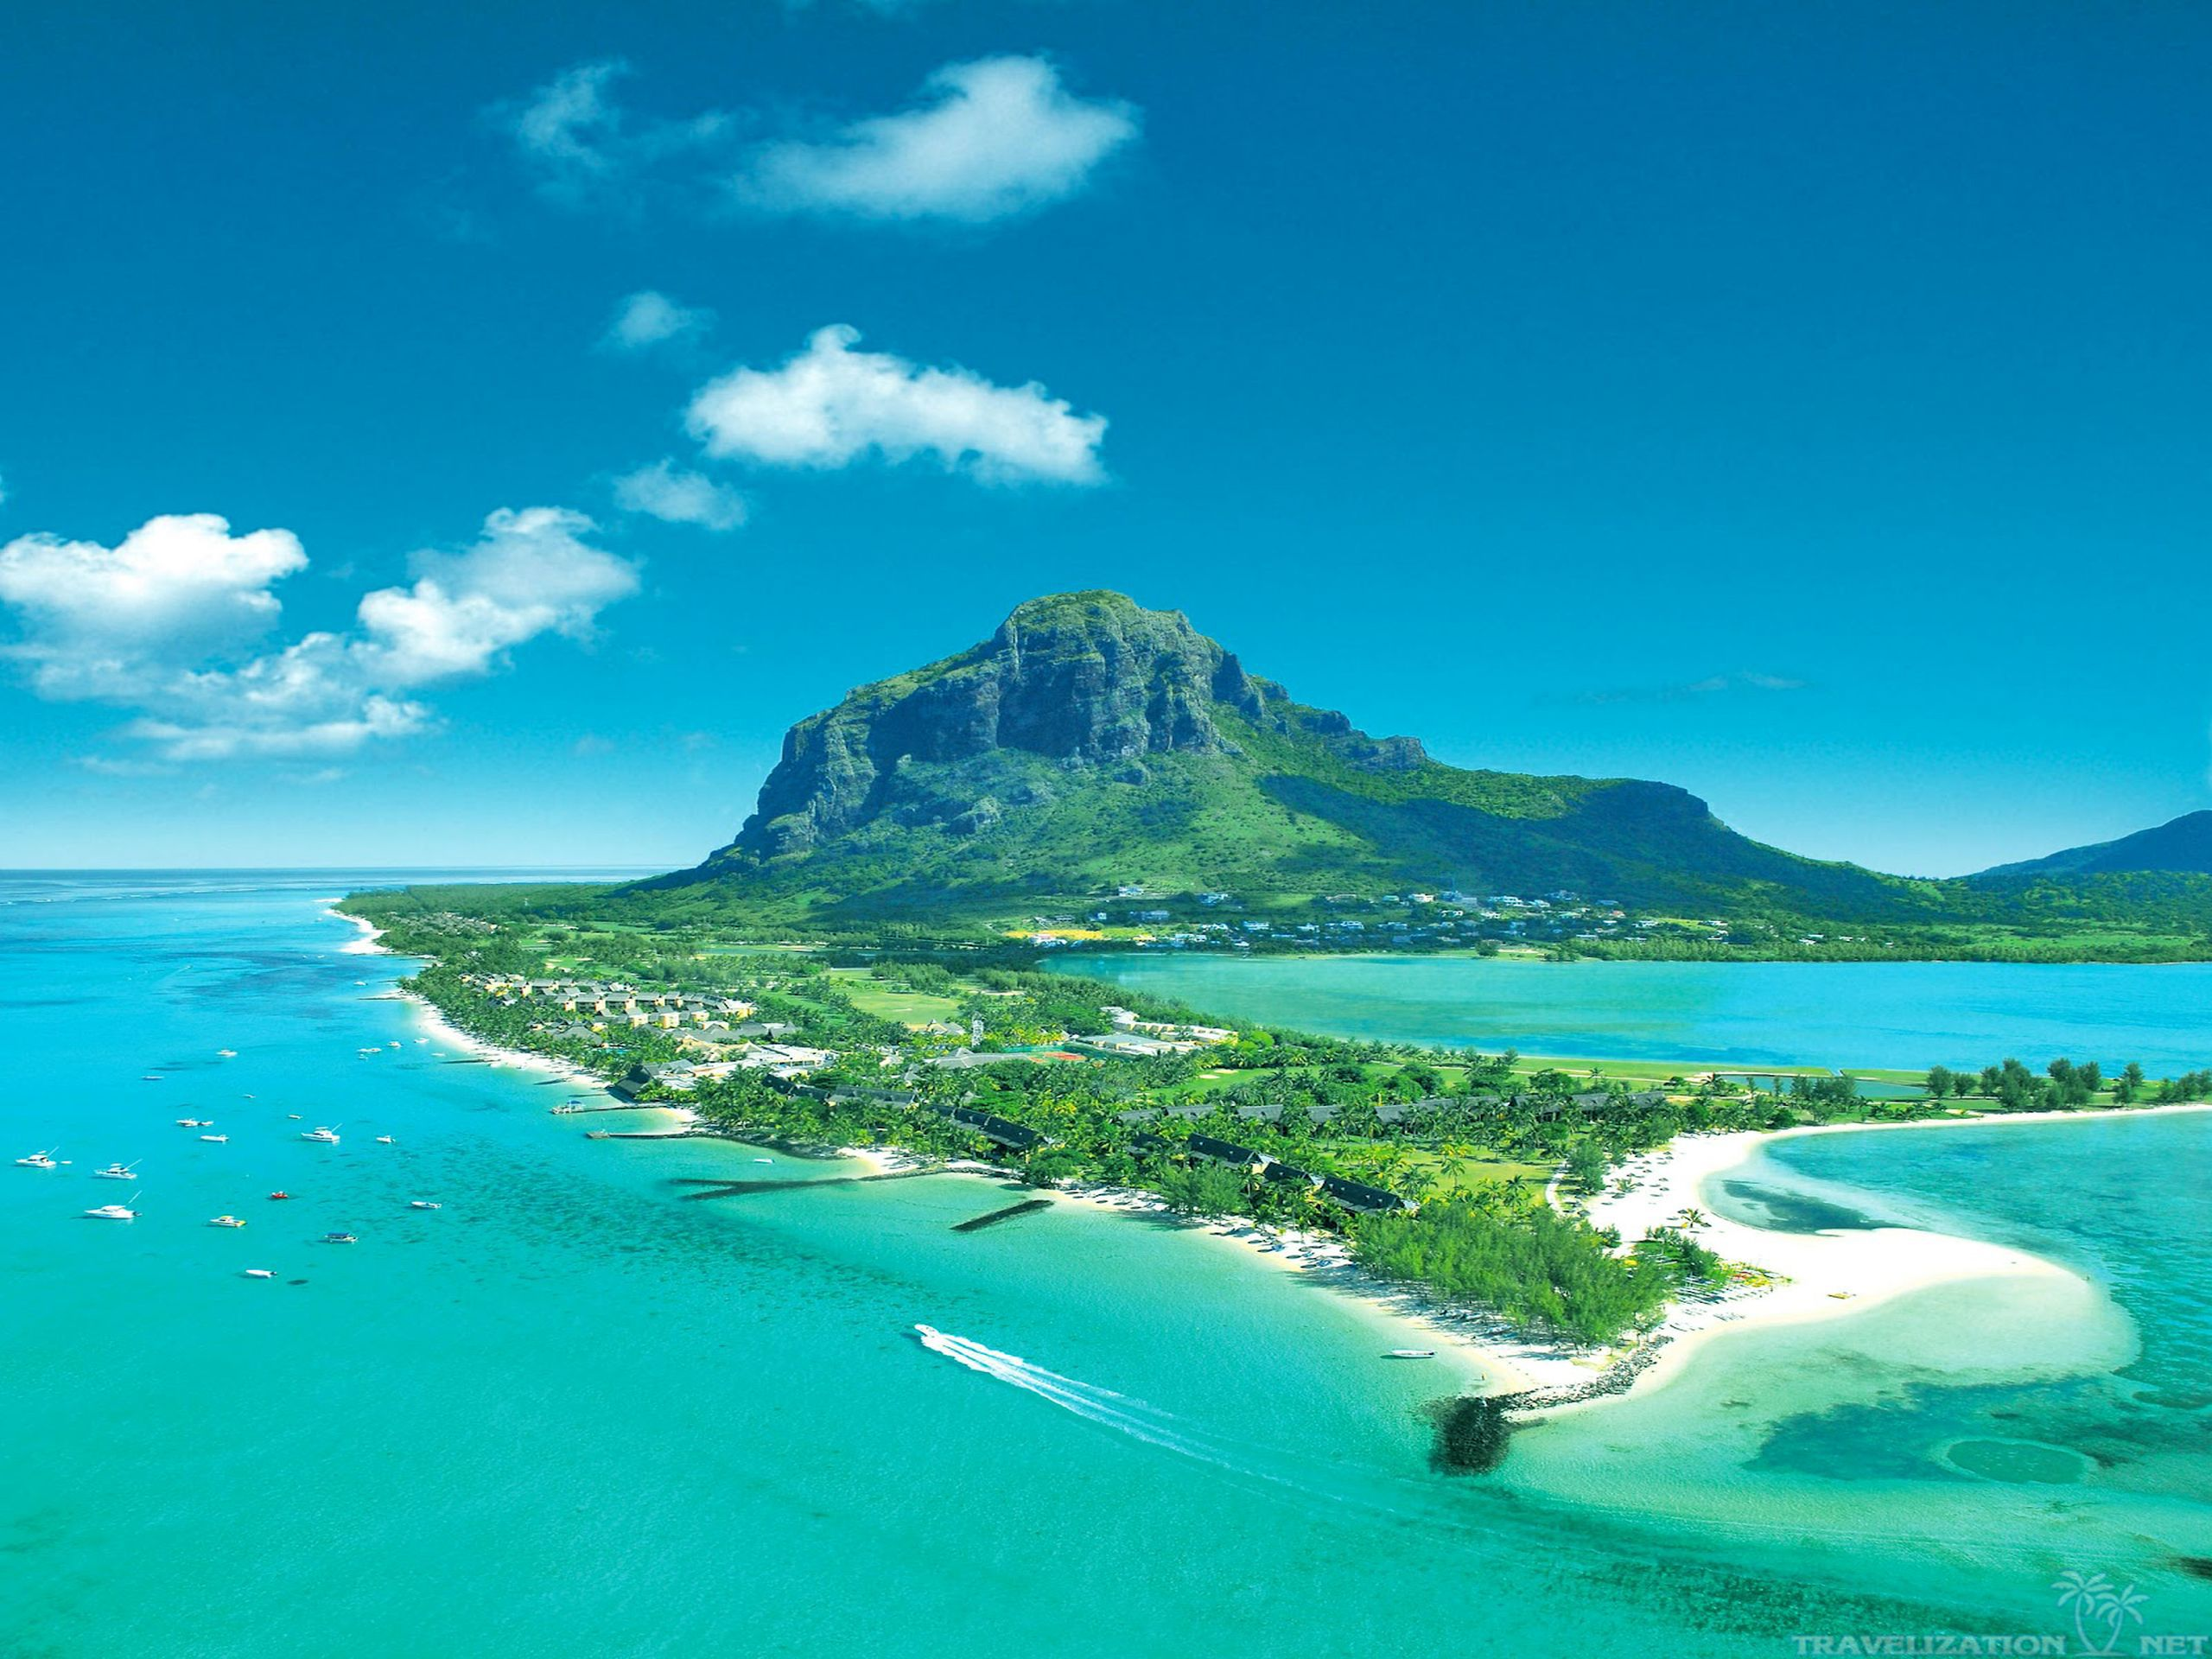 Photo Credit http://www.rocsgrp.com/travel/destinations/mauritius.html